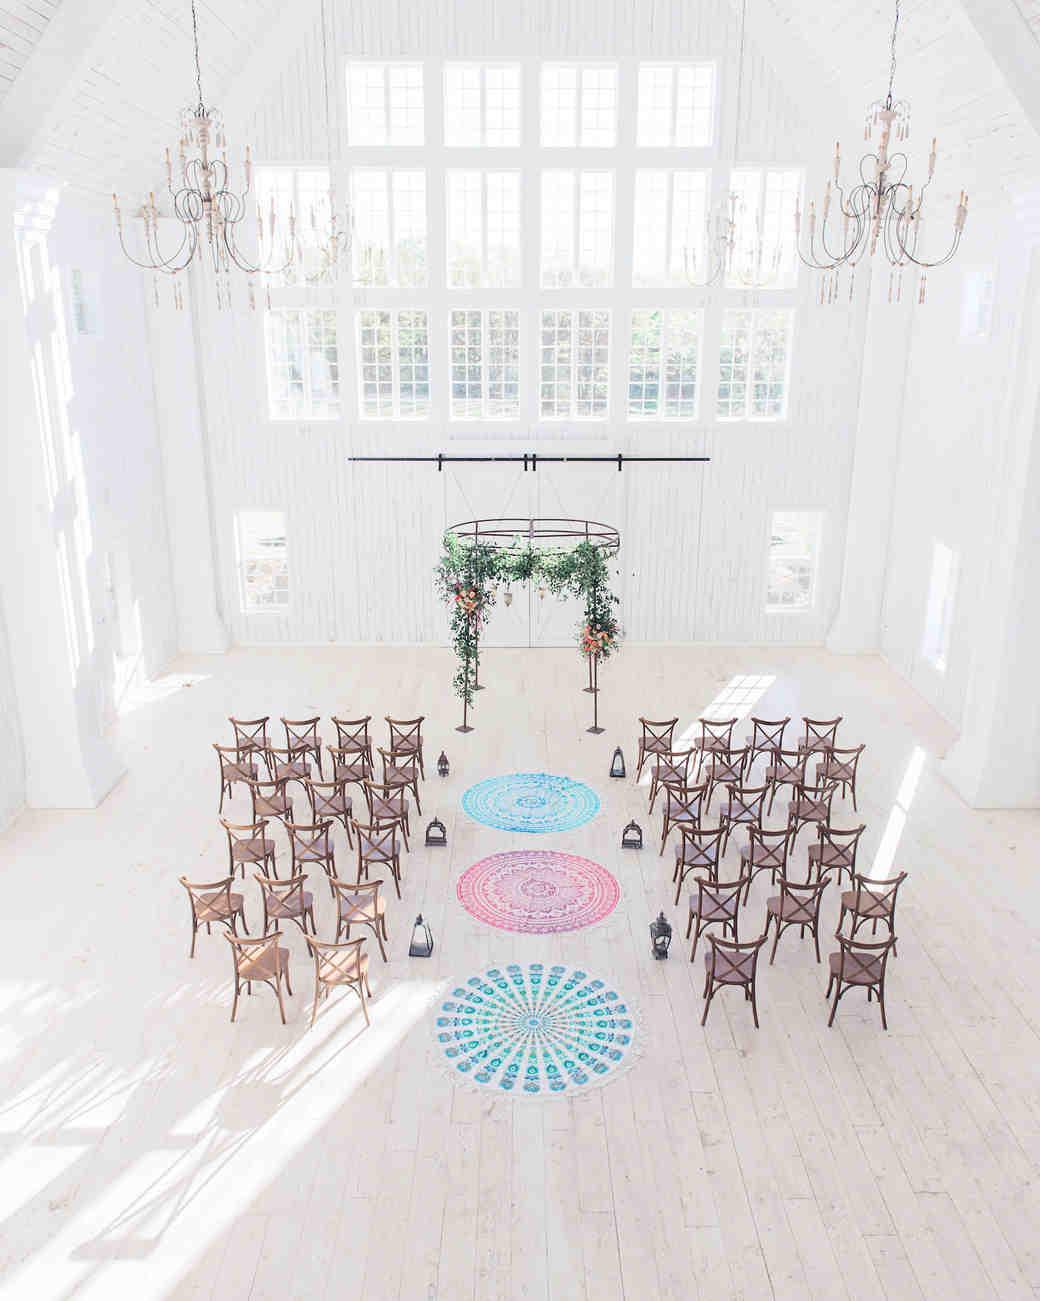 Aisle wth circular rugs